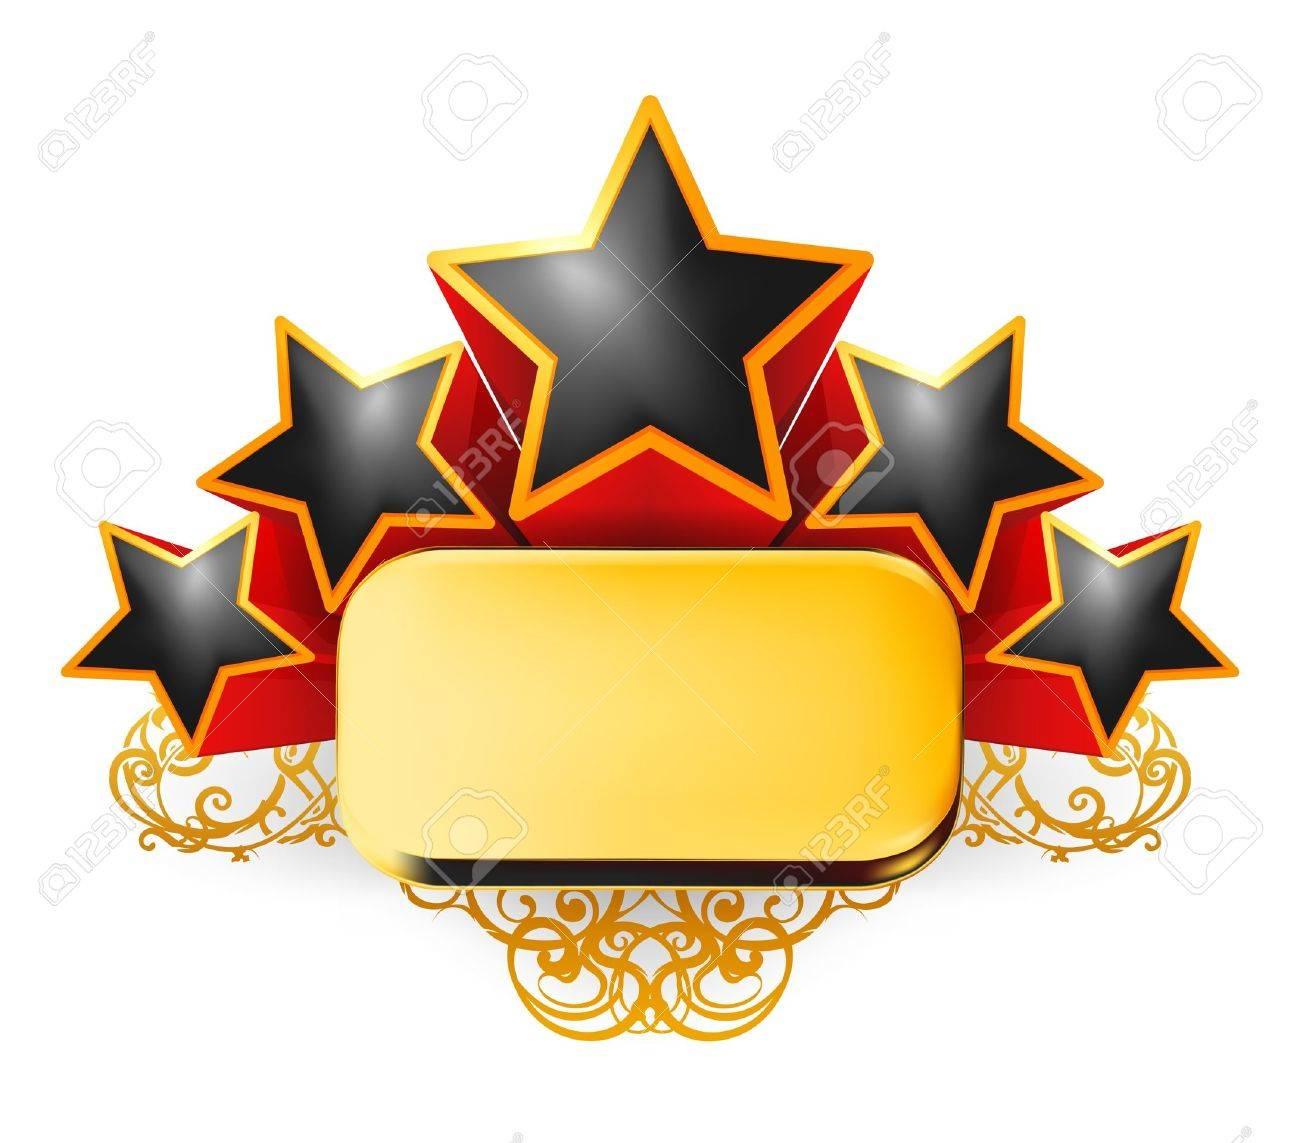 Vintage Emblem Stock Vector - 13739184